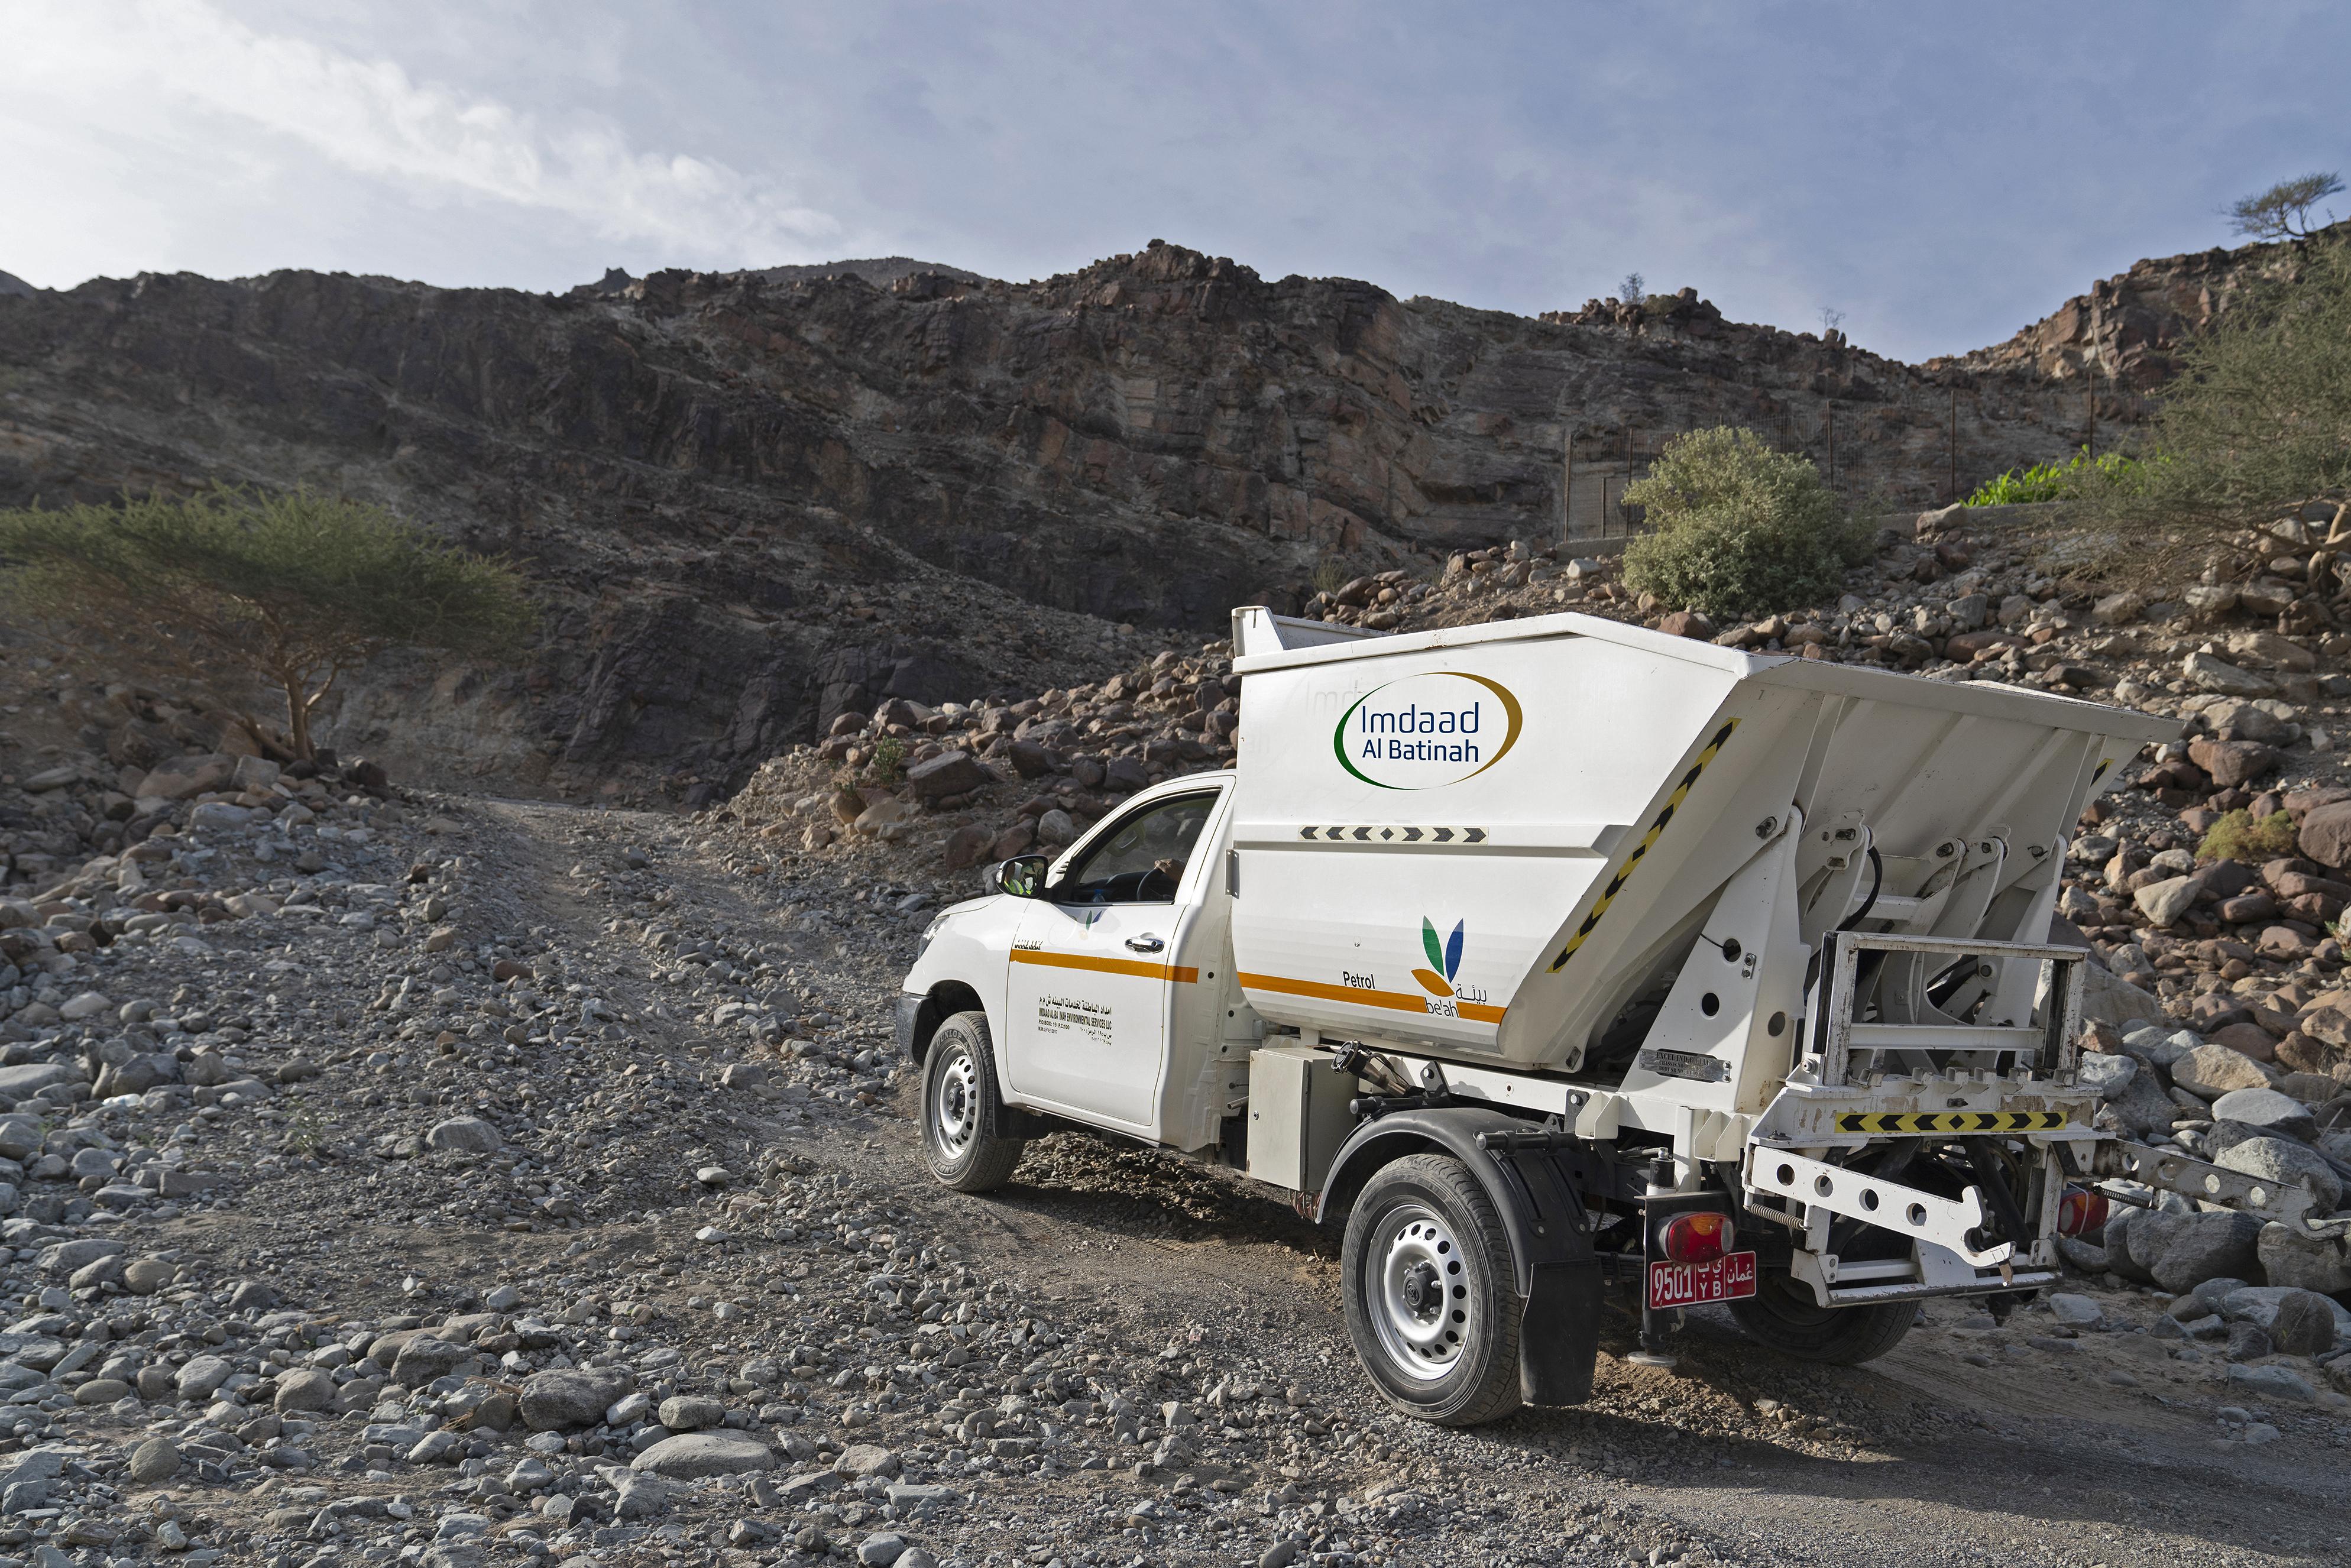 Imdaad playing vital role in Cyclone Shaheen clean-up efforts in Oman